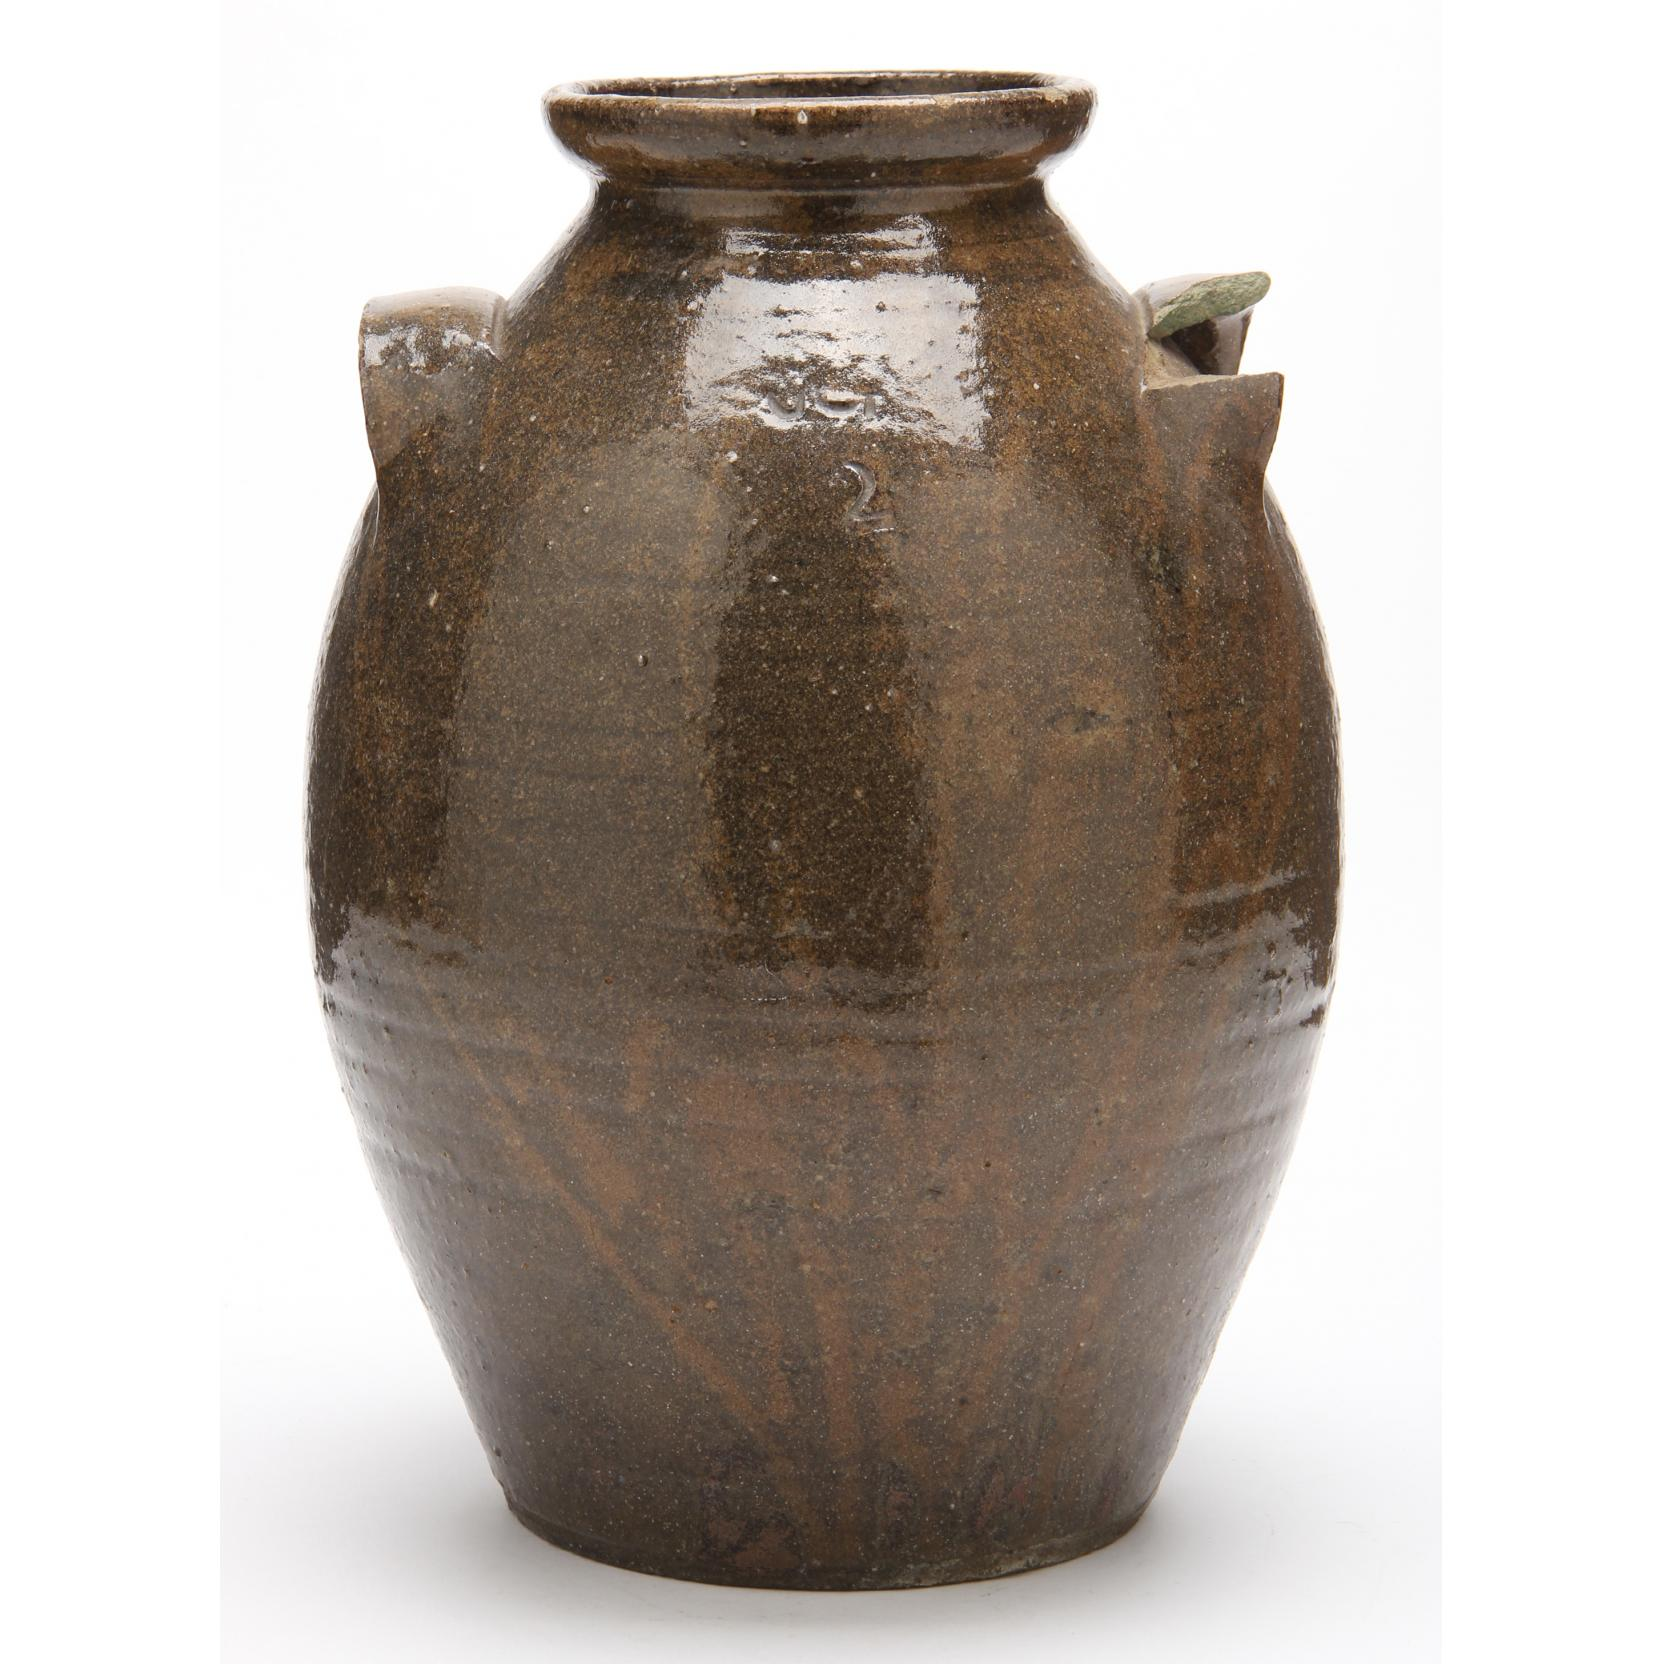 nc-pottery-john-goodman-1822-1907-lincoln-county